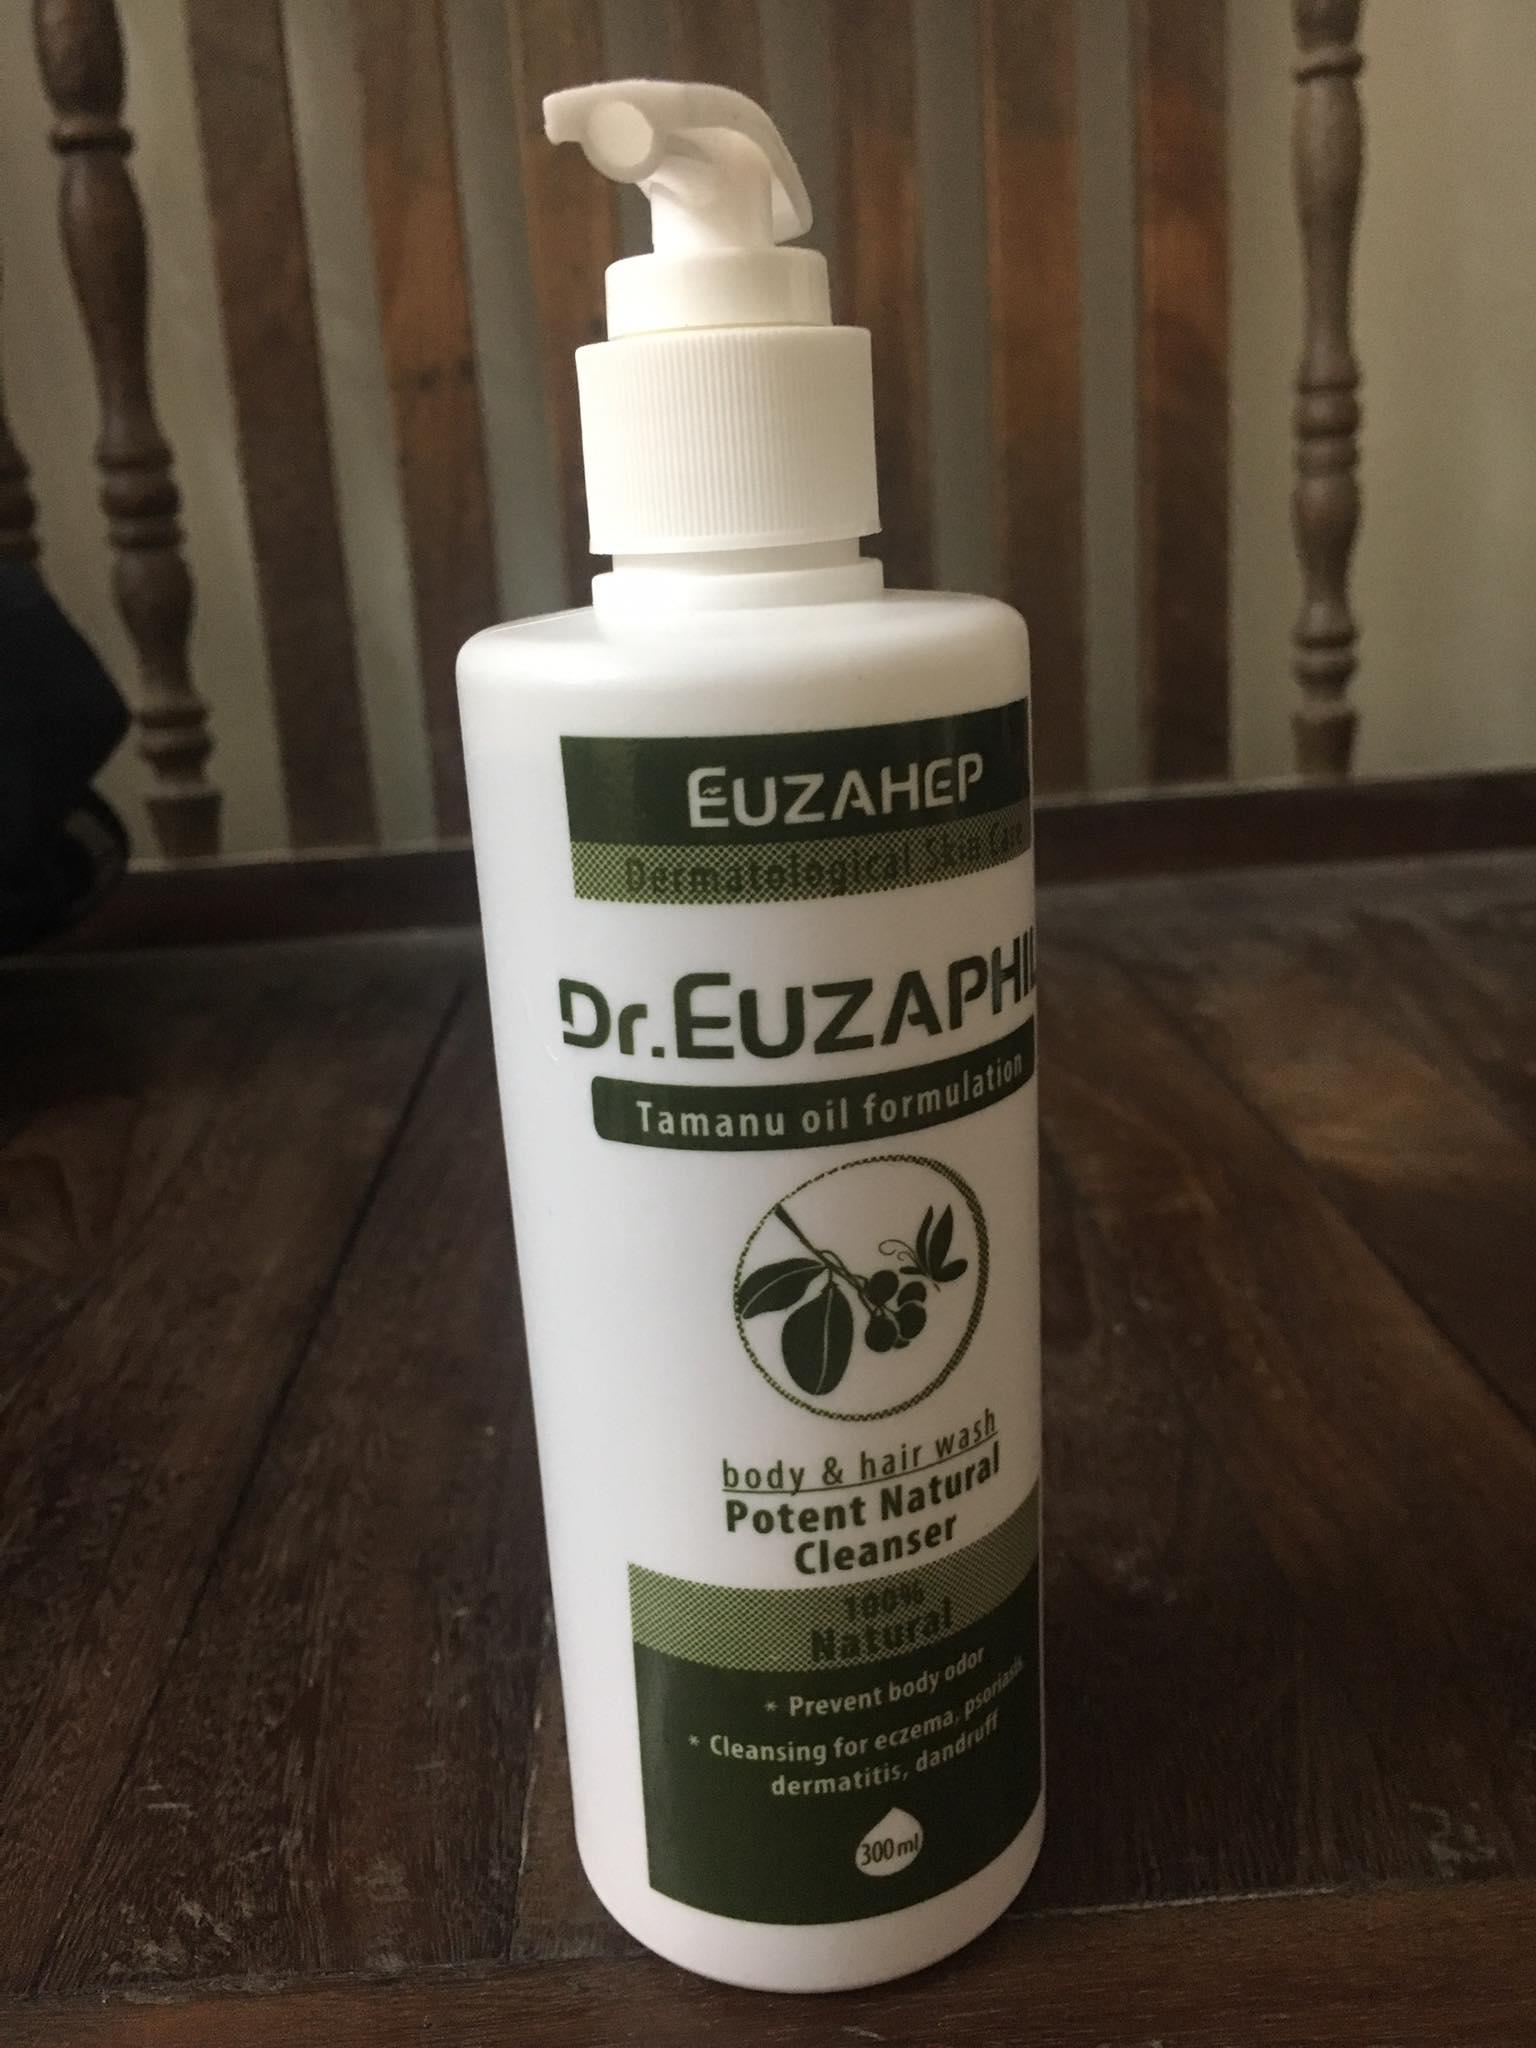 Sữa tắm gội dầu Mù U - Dr. EUZAPHIL Potent Natural Cleanser 300ml